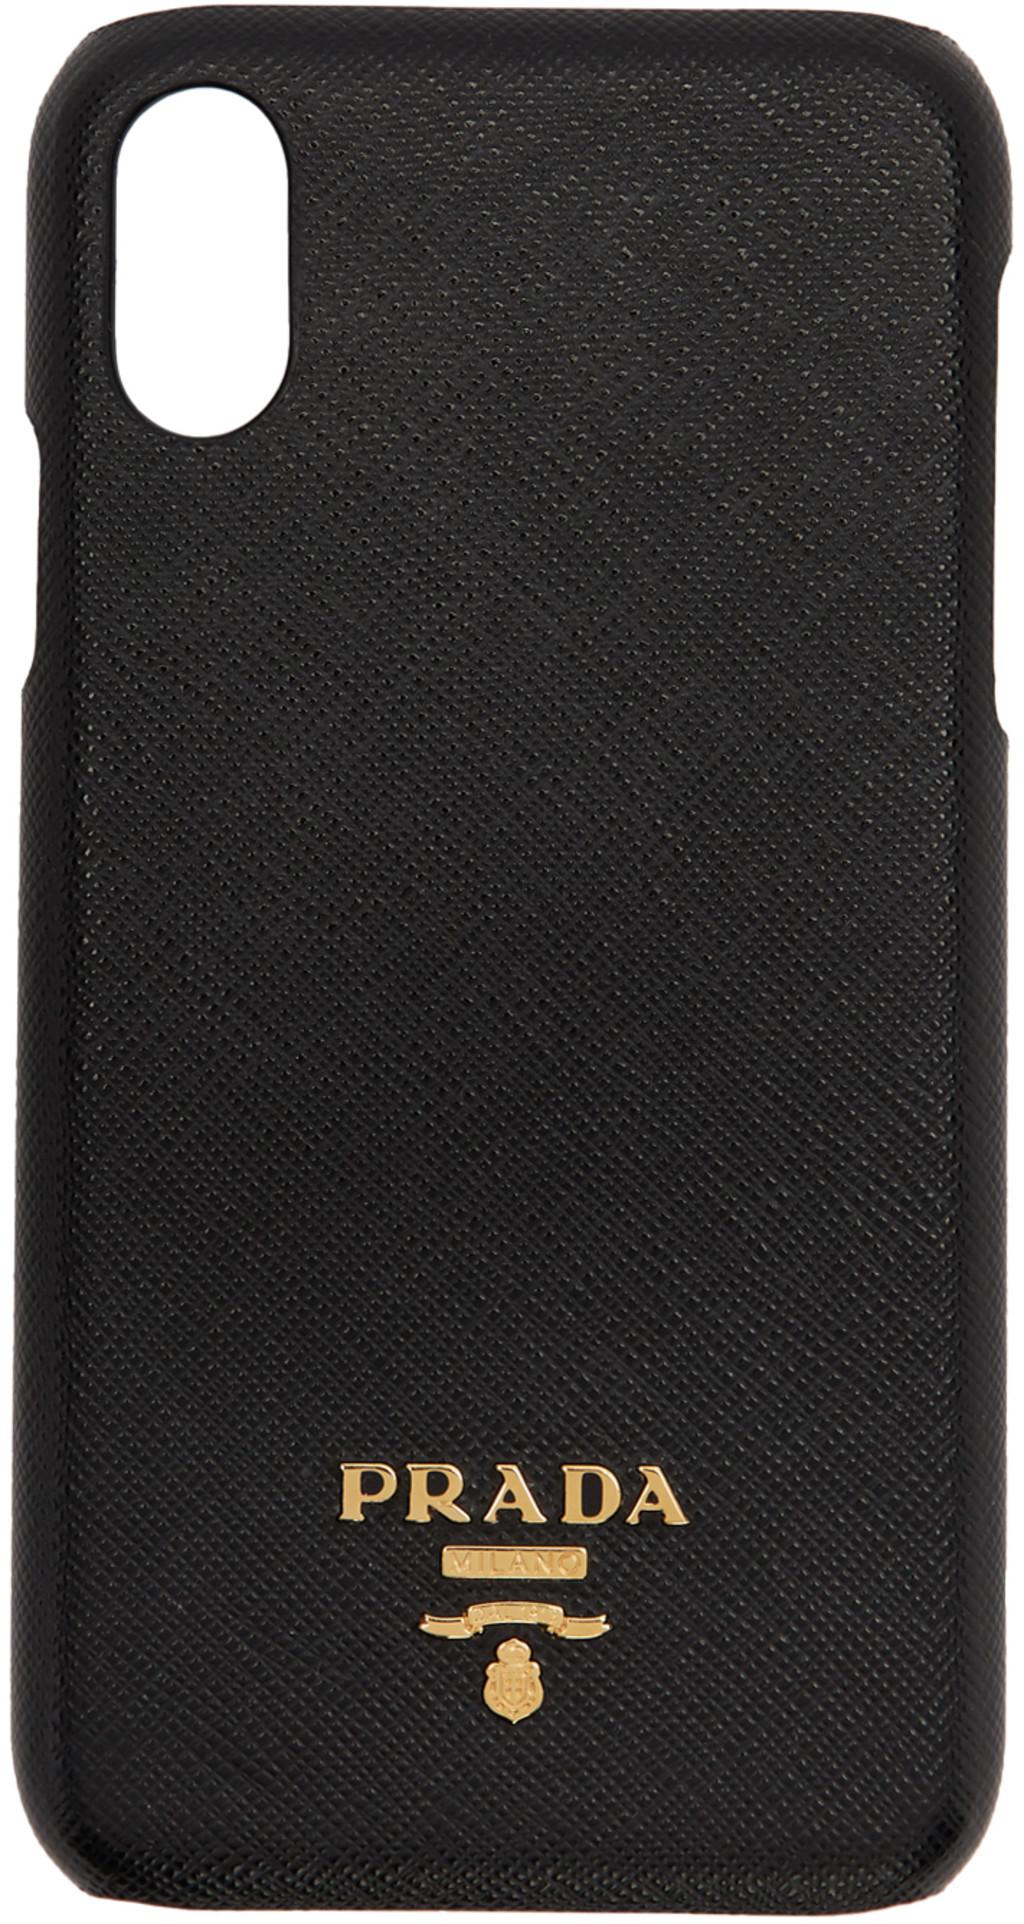 best website 696d5 d7d63 Black Saffiano iPhone XR Case